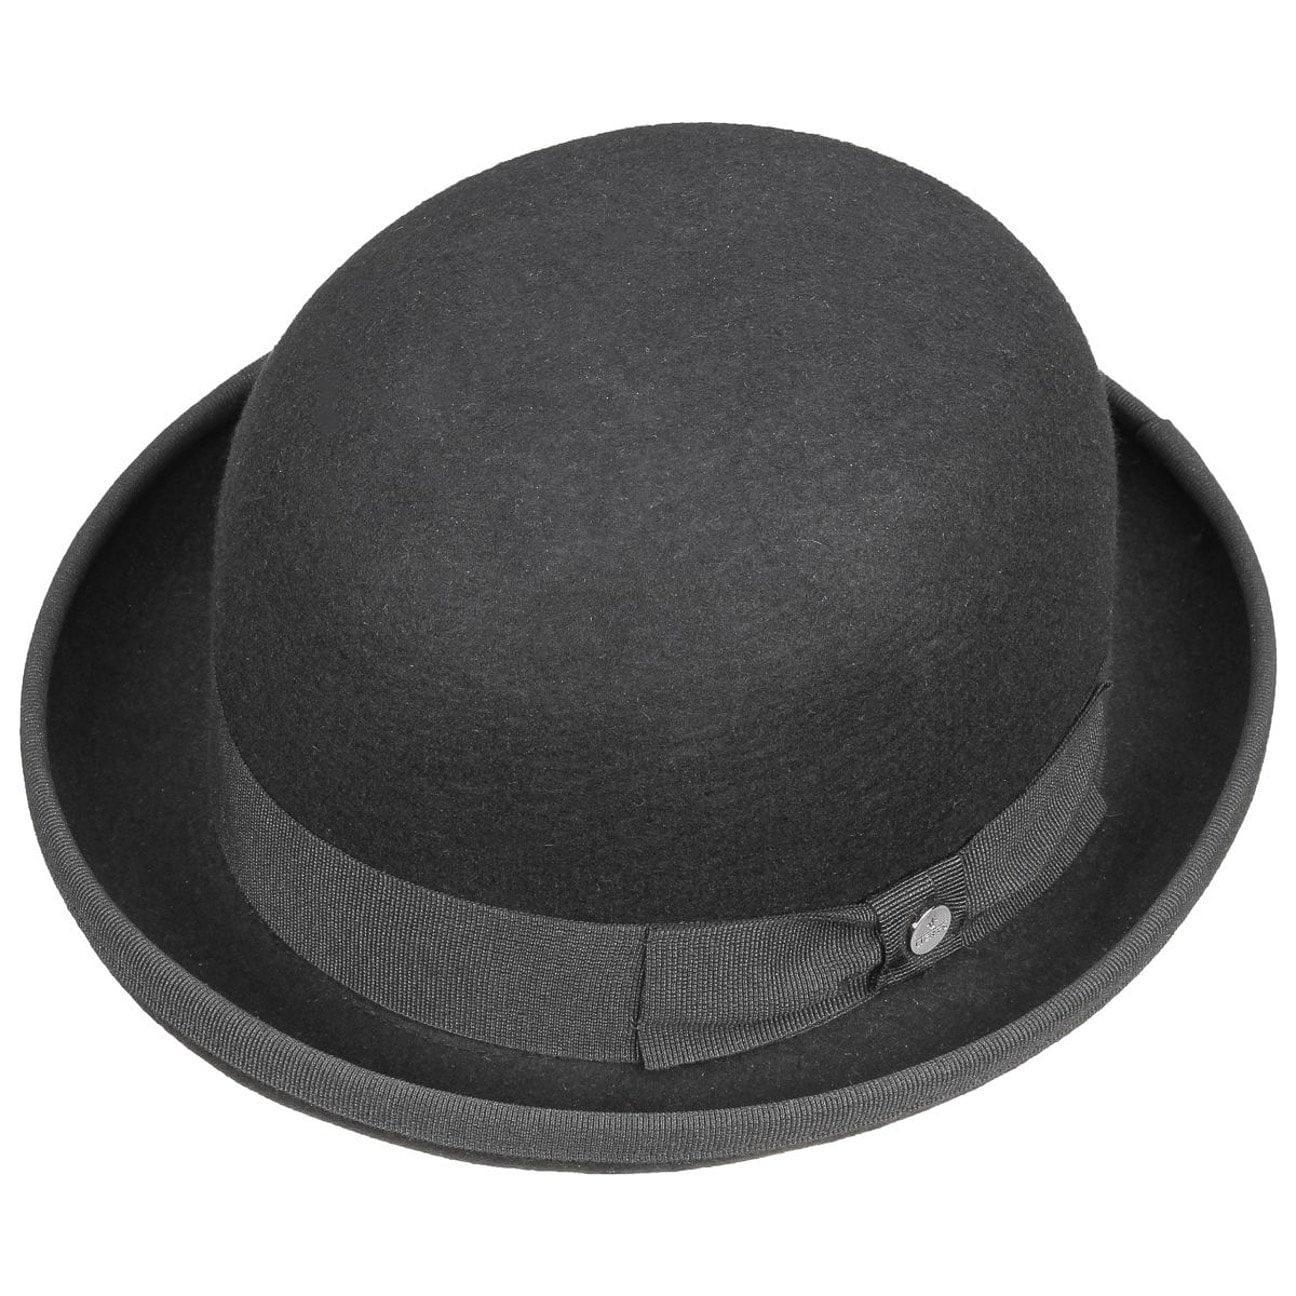 a678d50bcbd0a4 ... Wool Felt Bowler Hat Uni by Lierys - black 2 ...